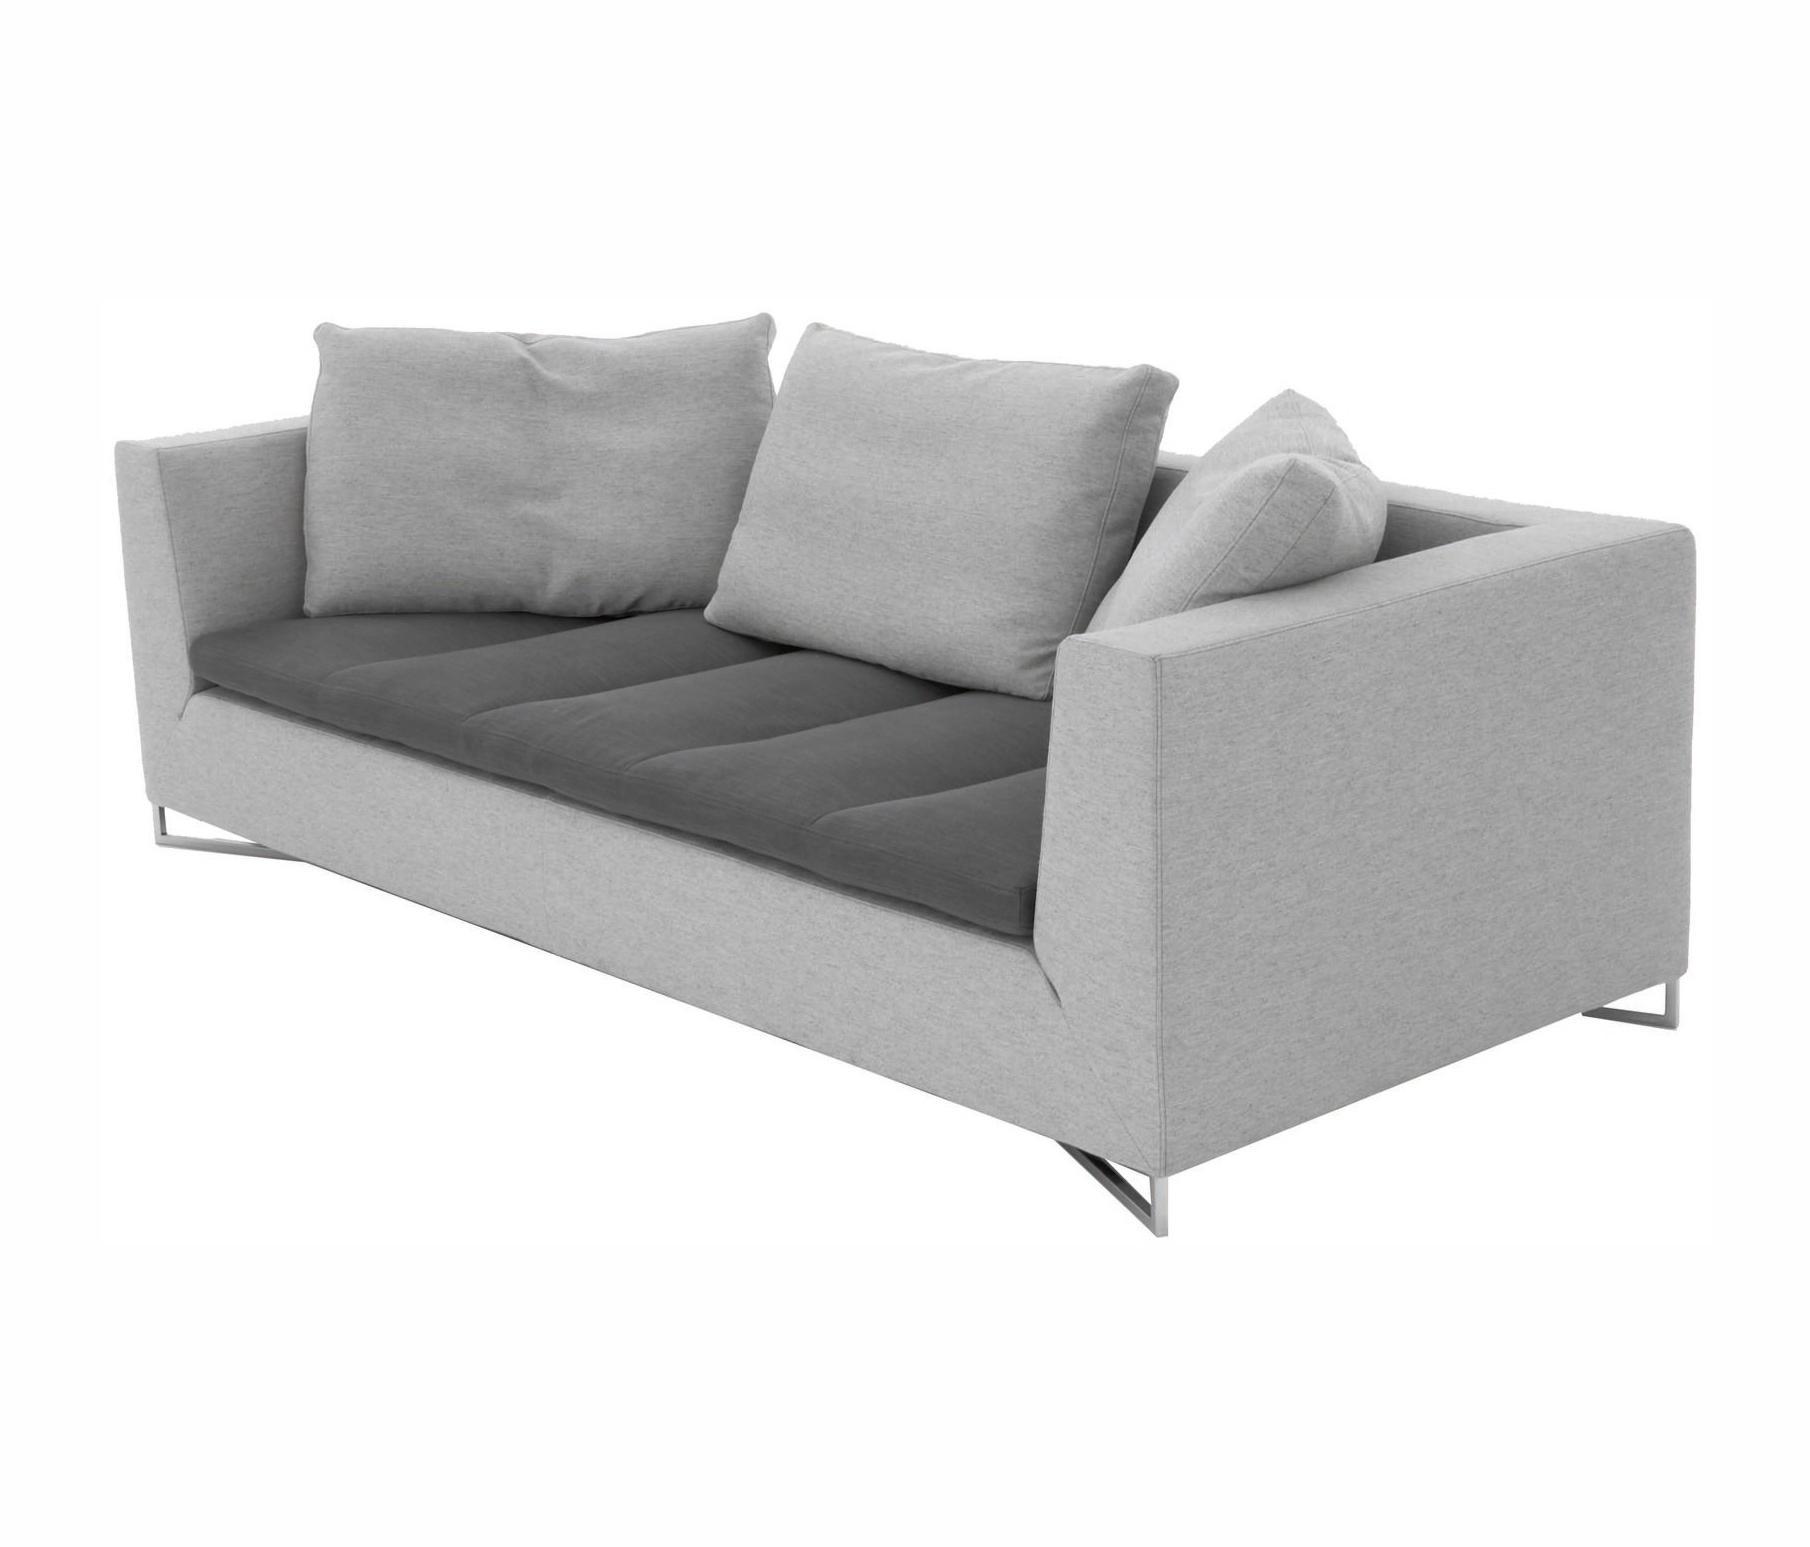 feng 3 sitzer gestell hochglanzverchromt komplettes element sofas von ligne roset architonic. Black Bedroom Furniture Sets. Home Design Ideas